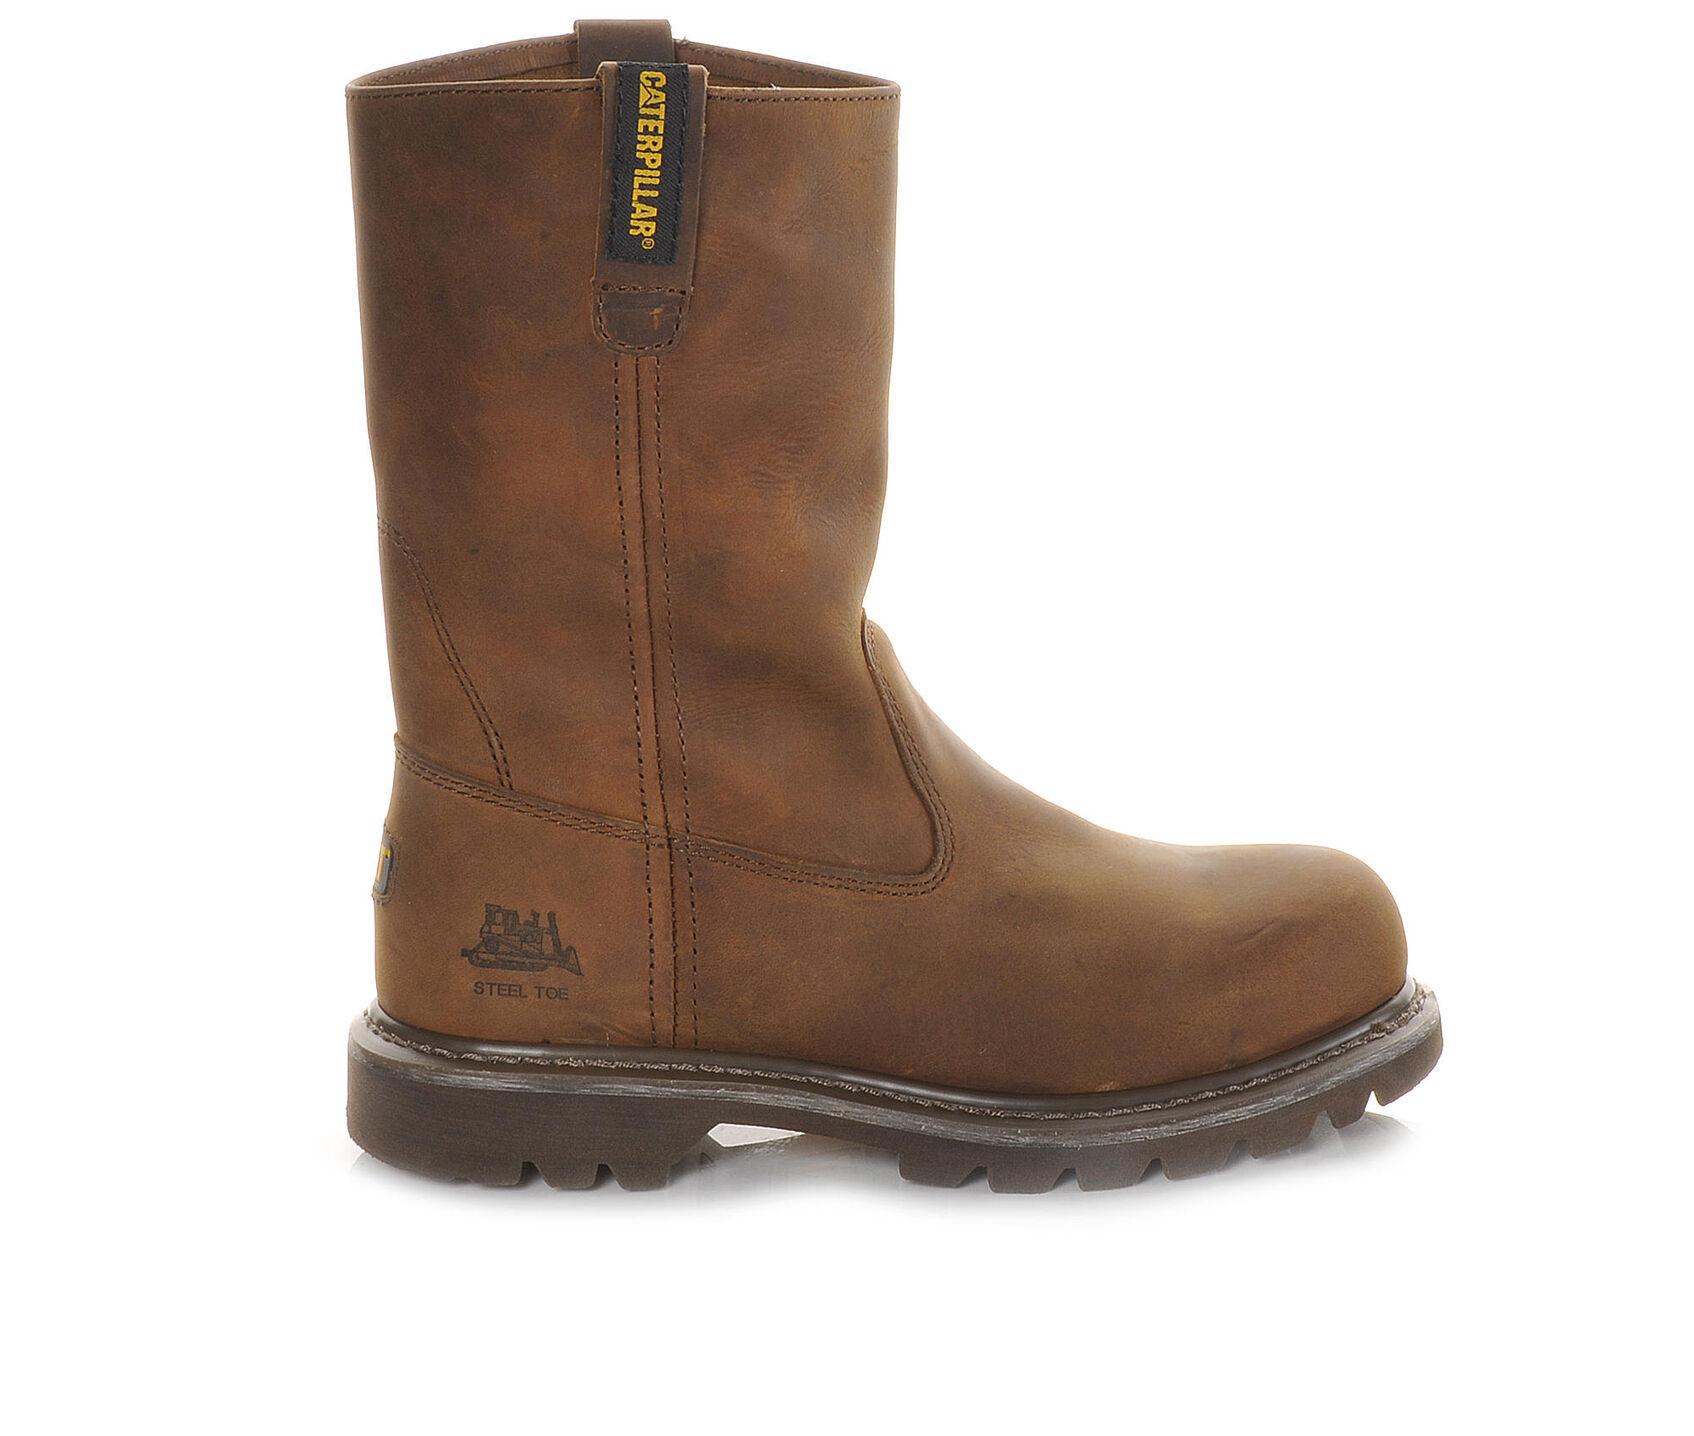 7343d3d00053 Women's Caterpillar Revolver Steel Toe Work Boots   Shoe Carnival